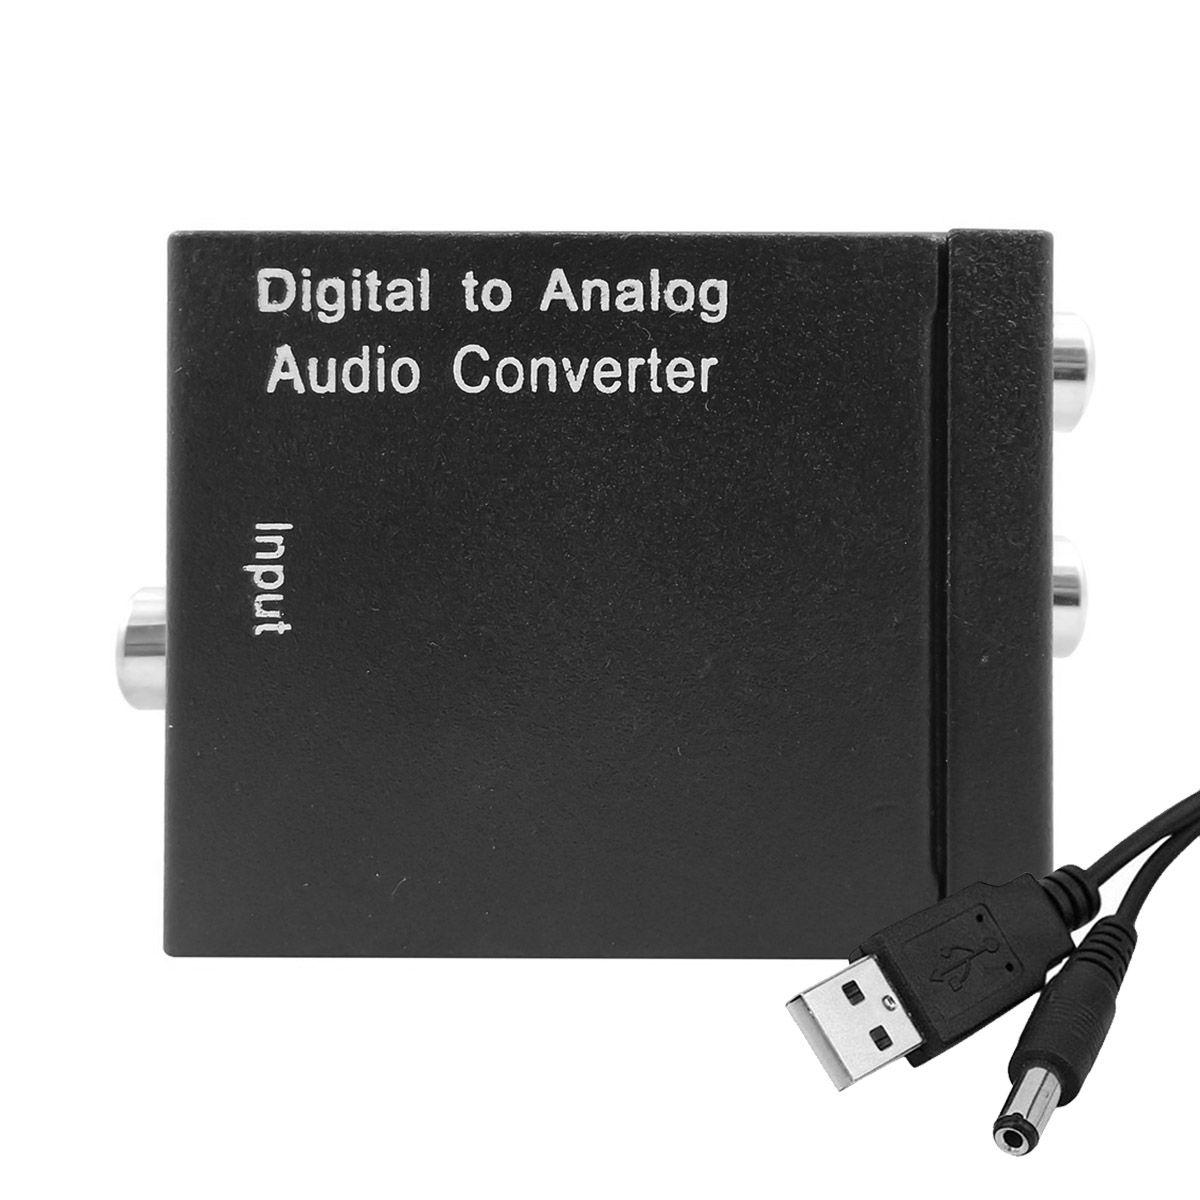 Conversor de Áudio Digital Óptico e Coaxial para Analógico Rca + Cabo USB DC